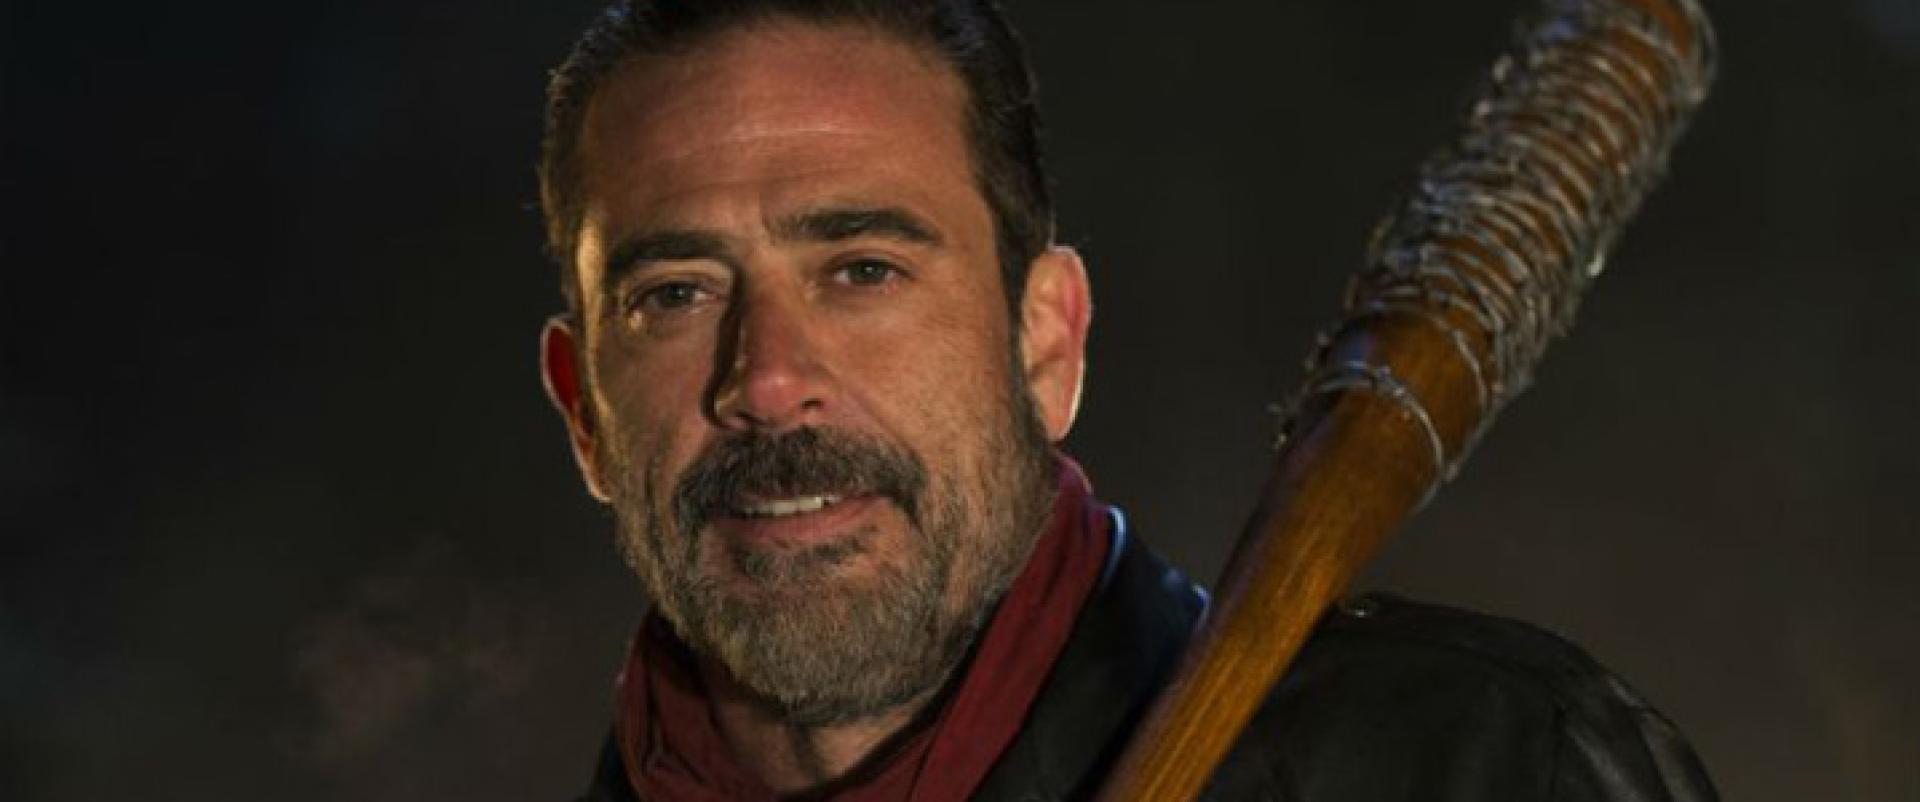 The Walking Dead, 7. évad: egy jelenet